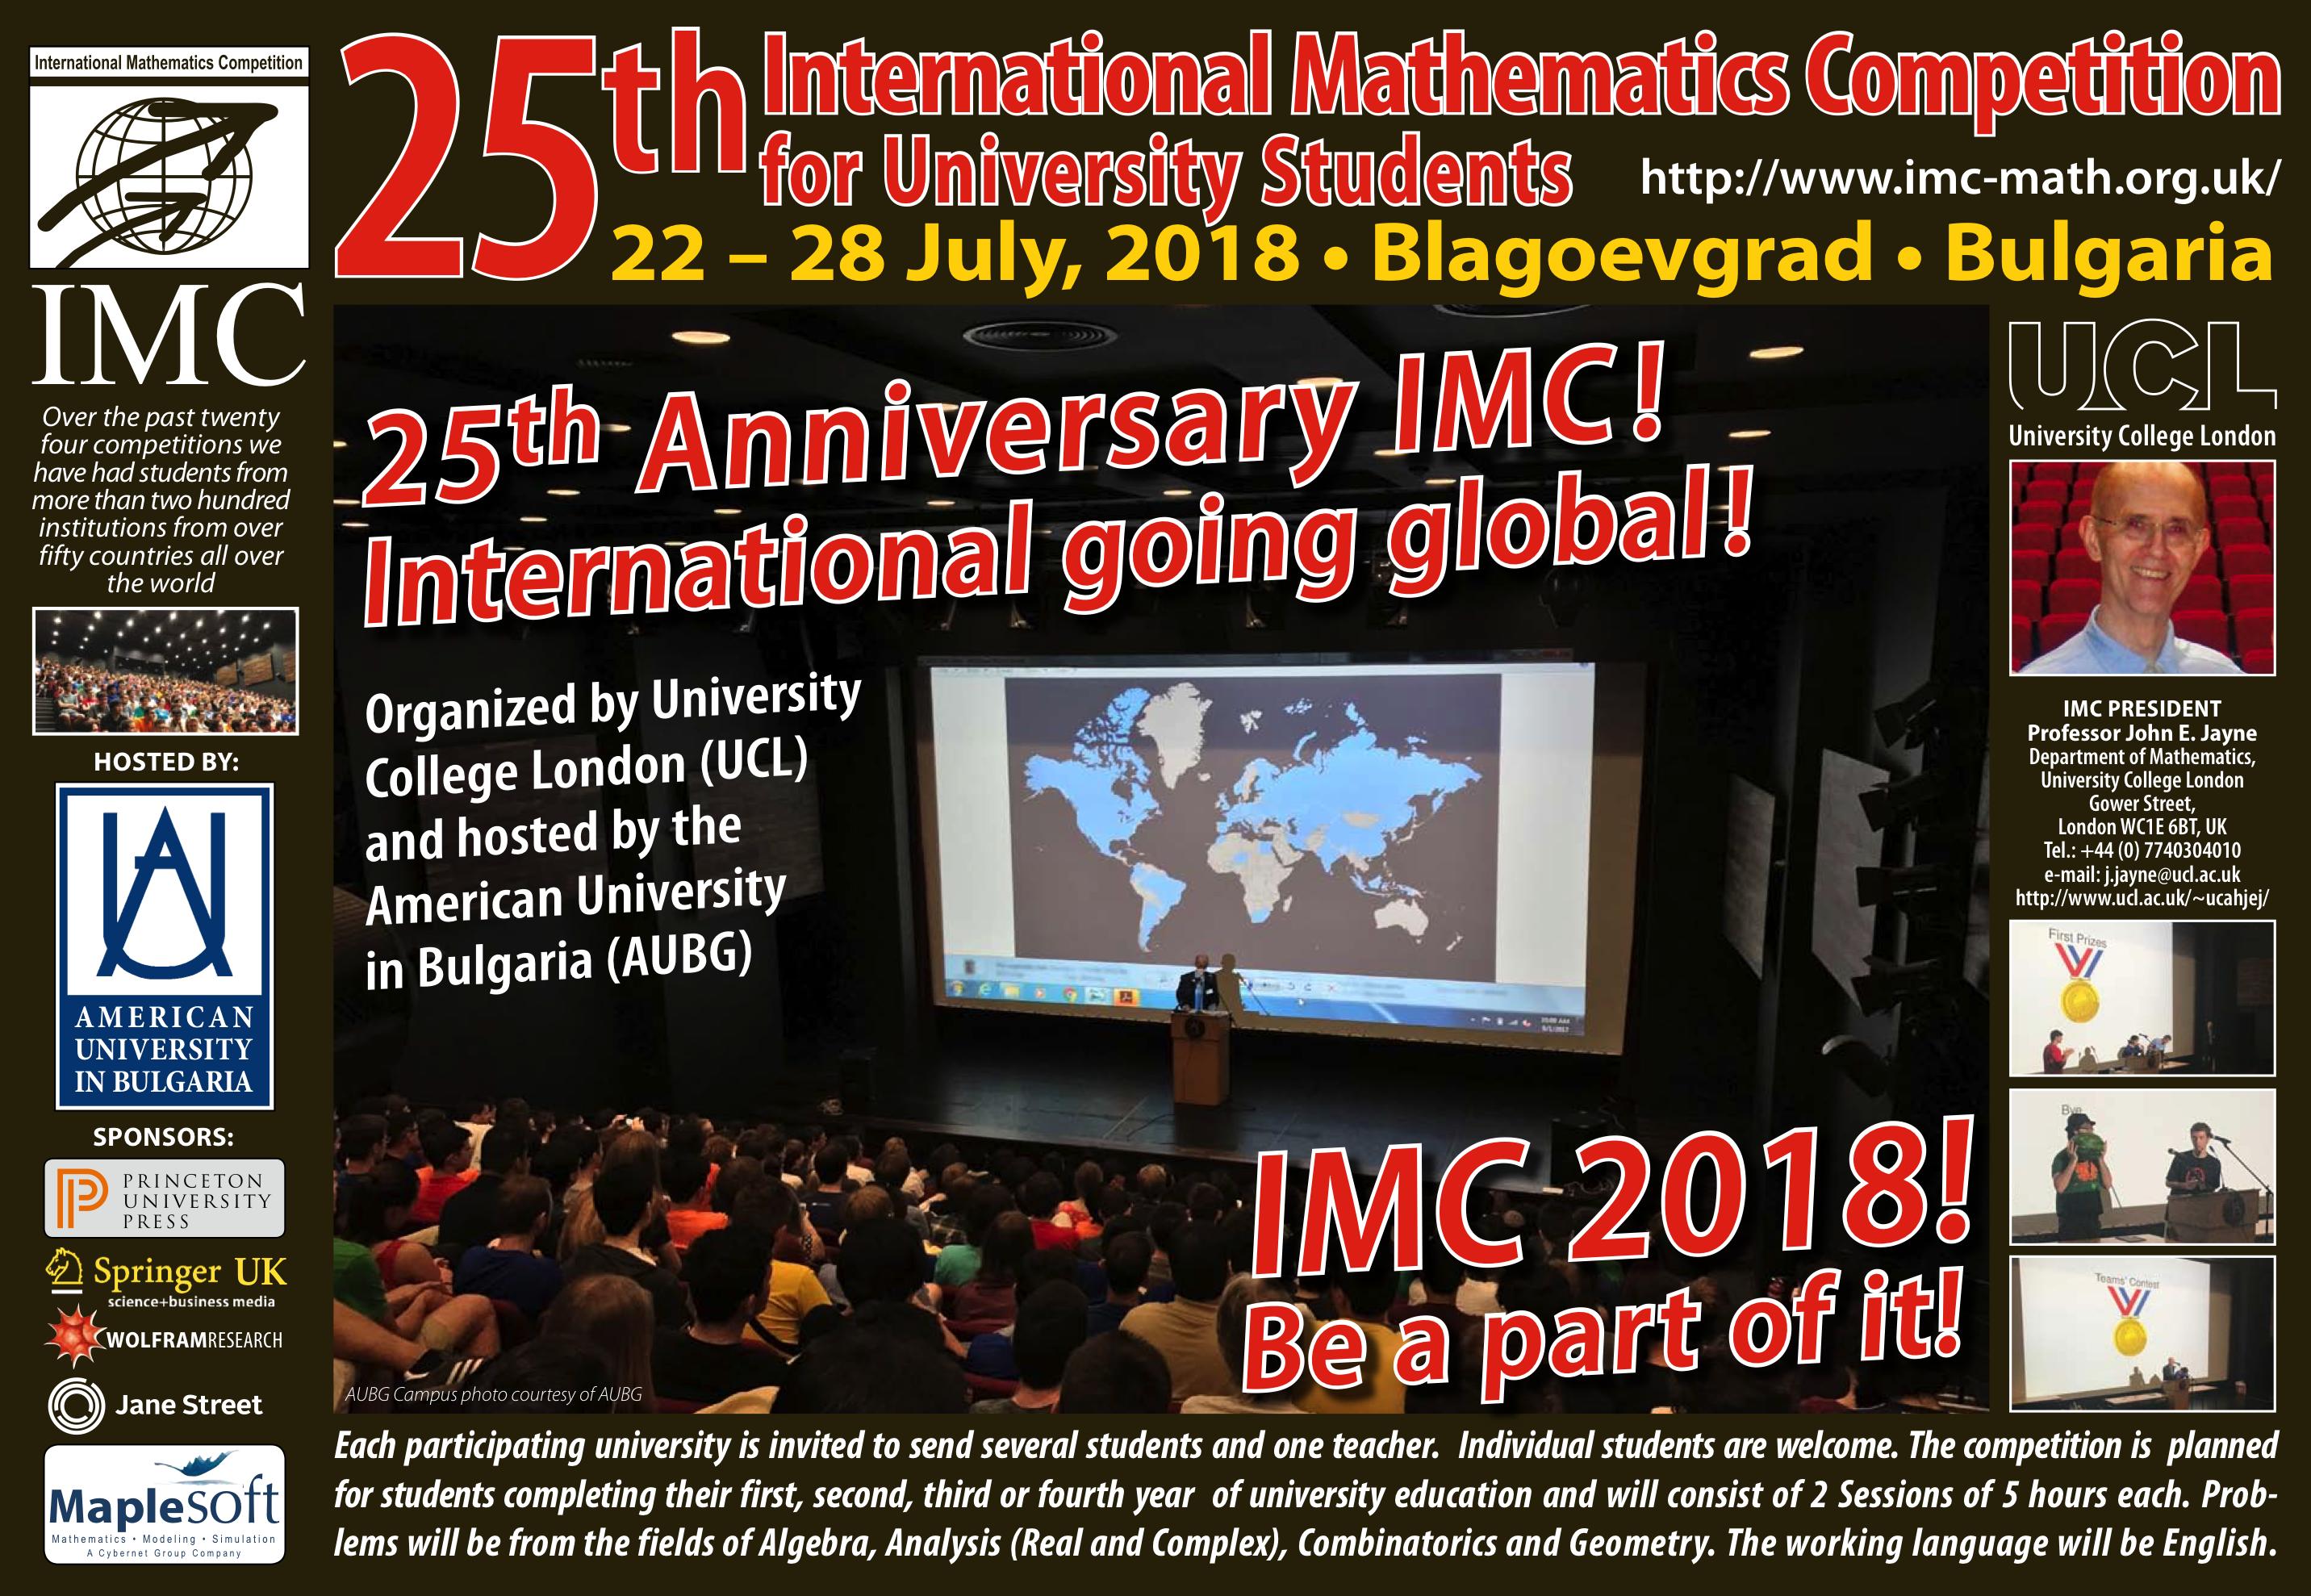 IMC - International Mathematics Competition for University